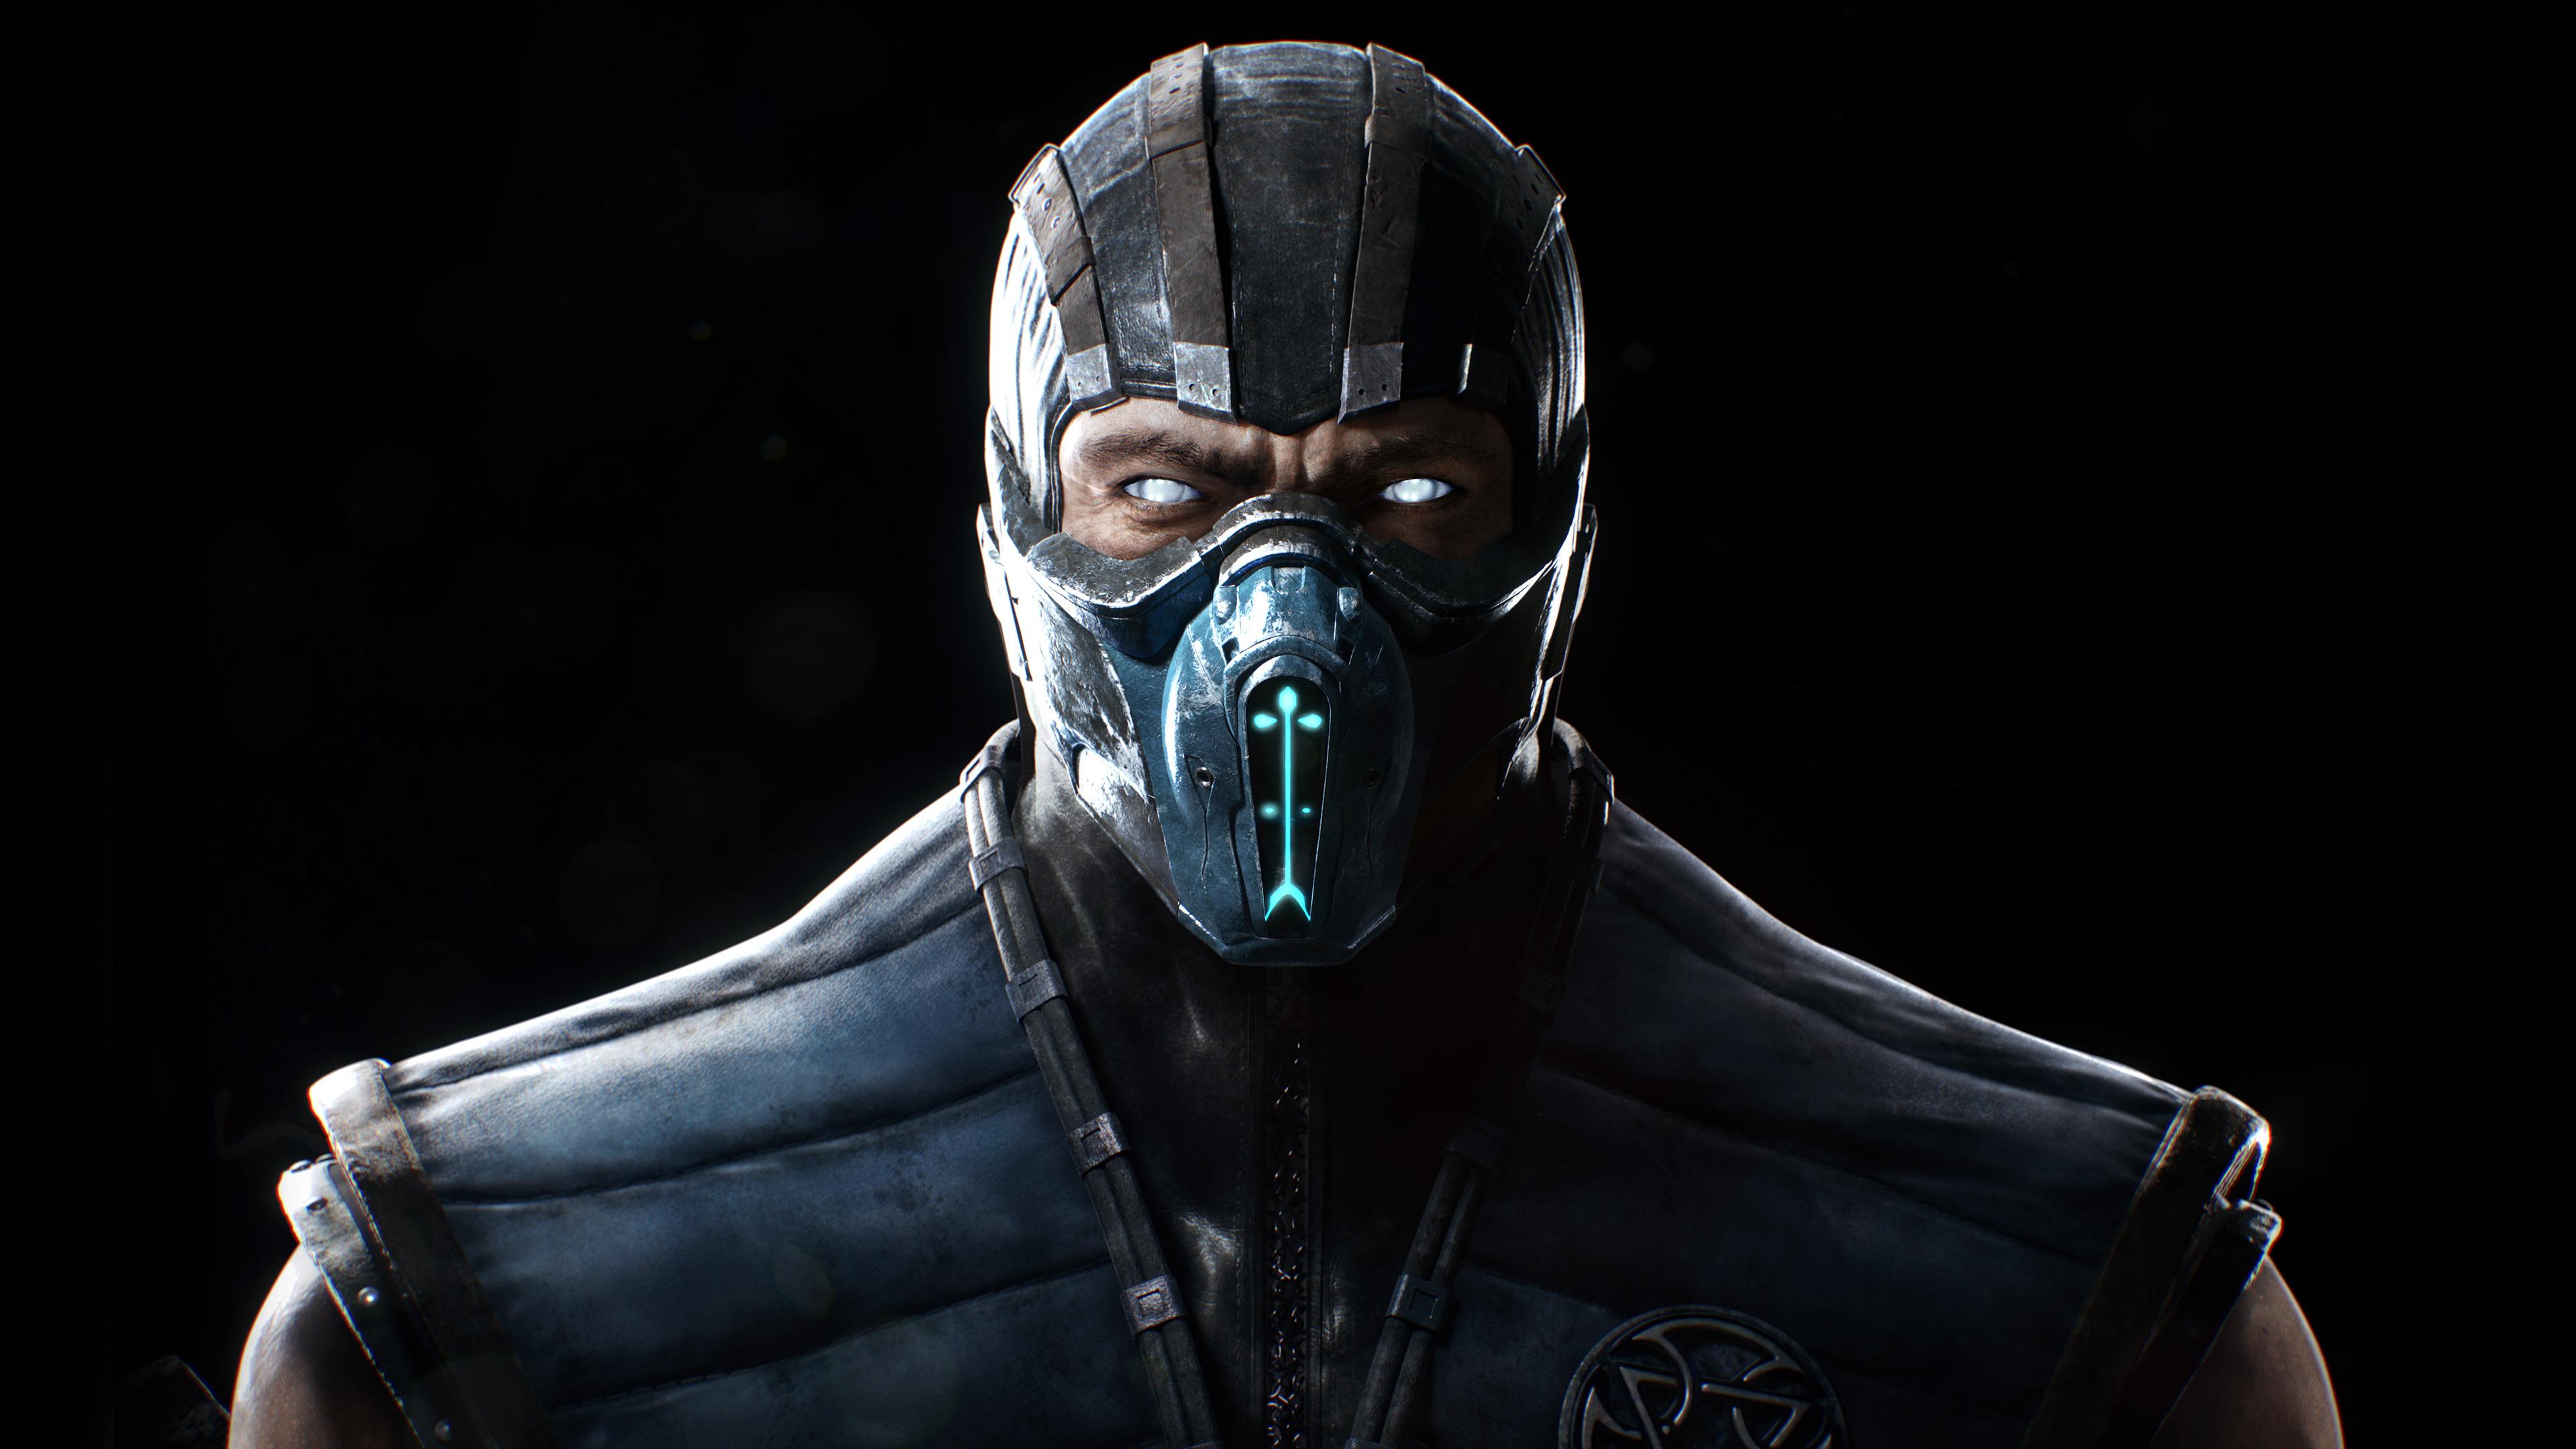 Mortal Kombat X Sub Zero Wallpapers HD Wallpapers 3840x2160